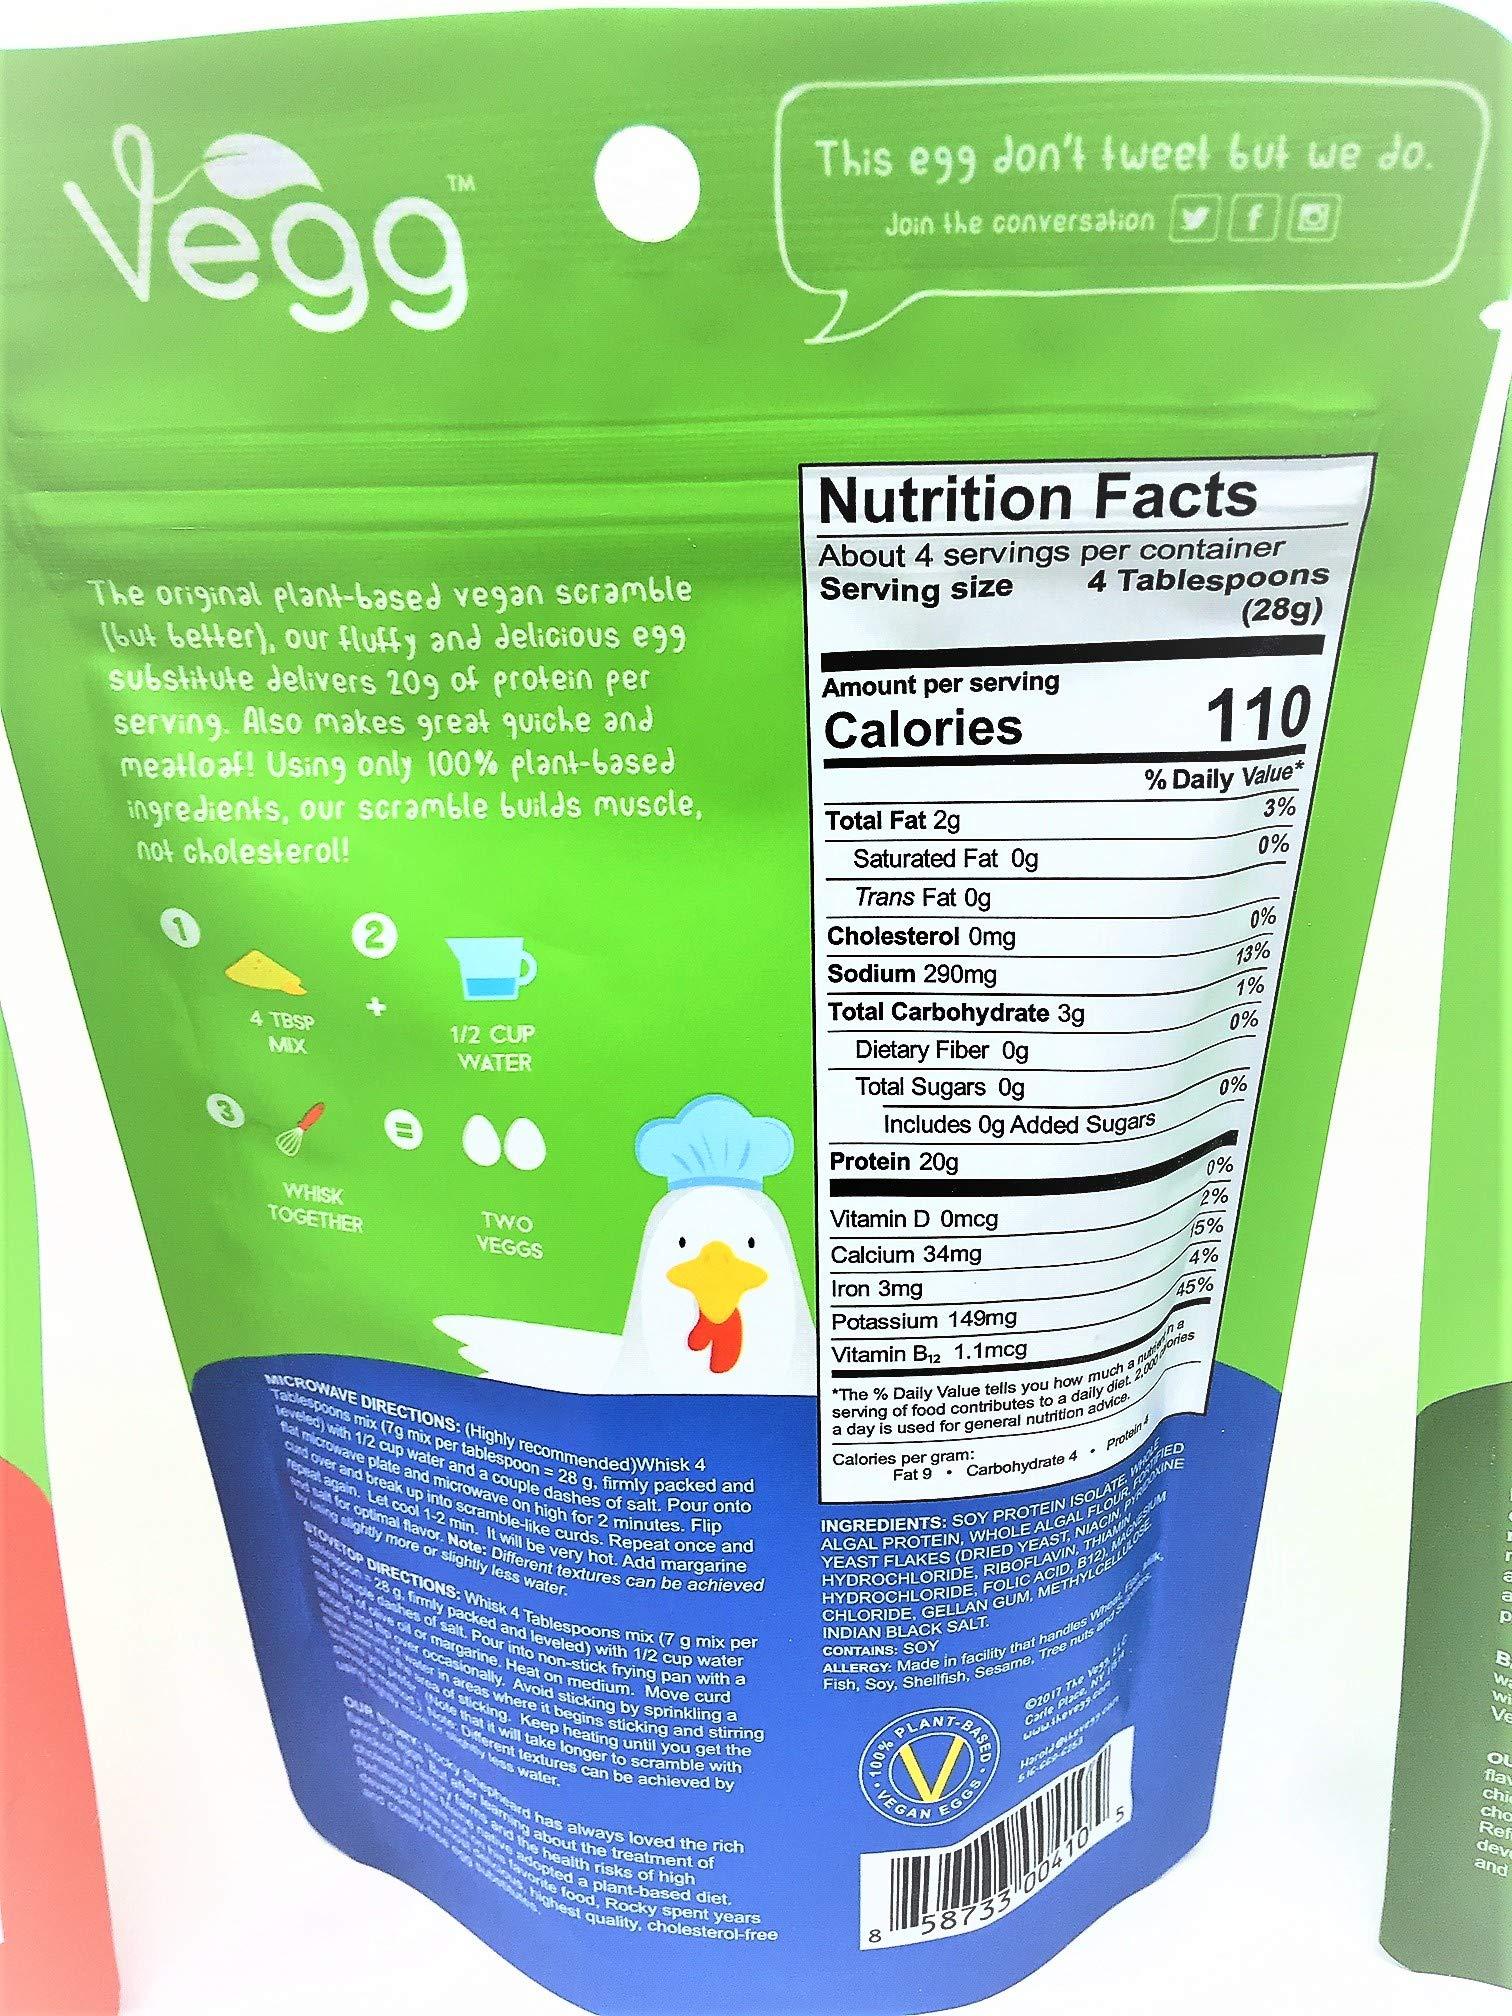 The Vegg Vegan Mega Pack Vegan Egg Yolk + Power Scramble + French Toast Mix + Uncaged Baking Mix + Egg Wisk + Measuring Cups and Spoons + The Vegg Cookbook by The Vegg (Image #8)